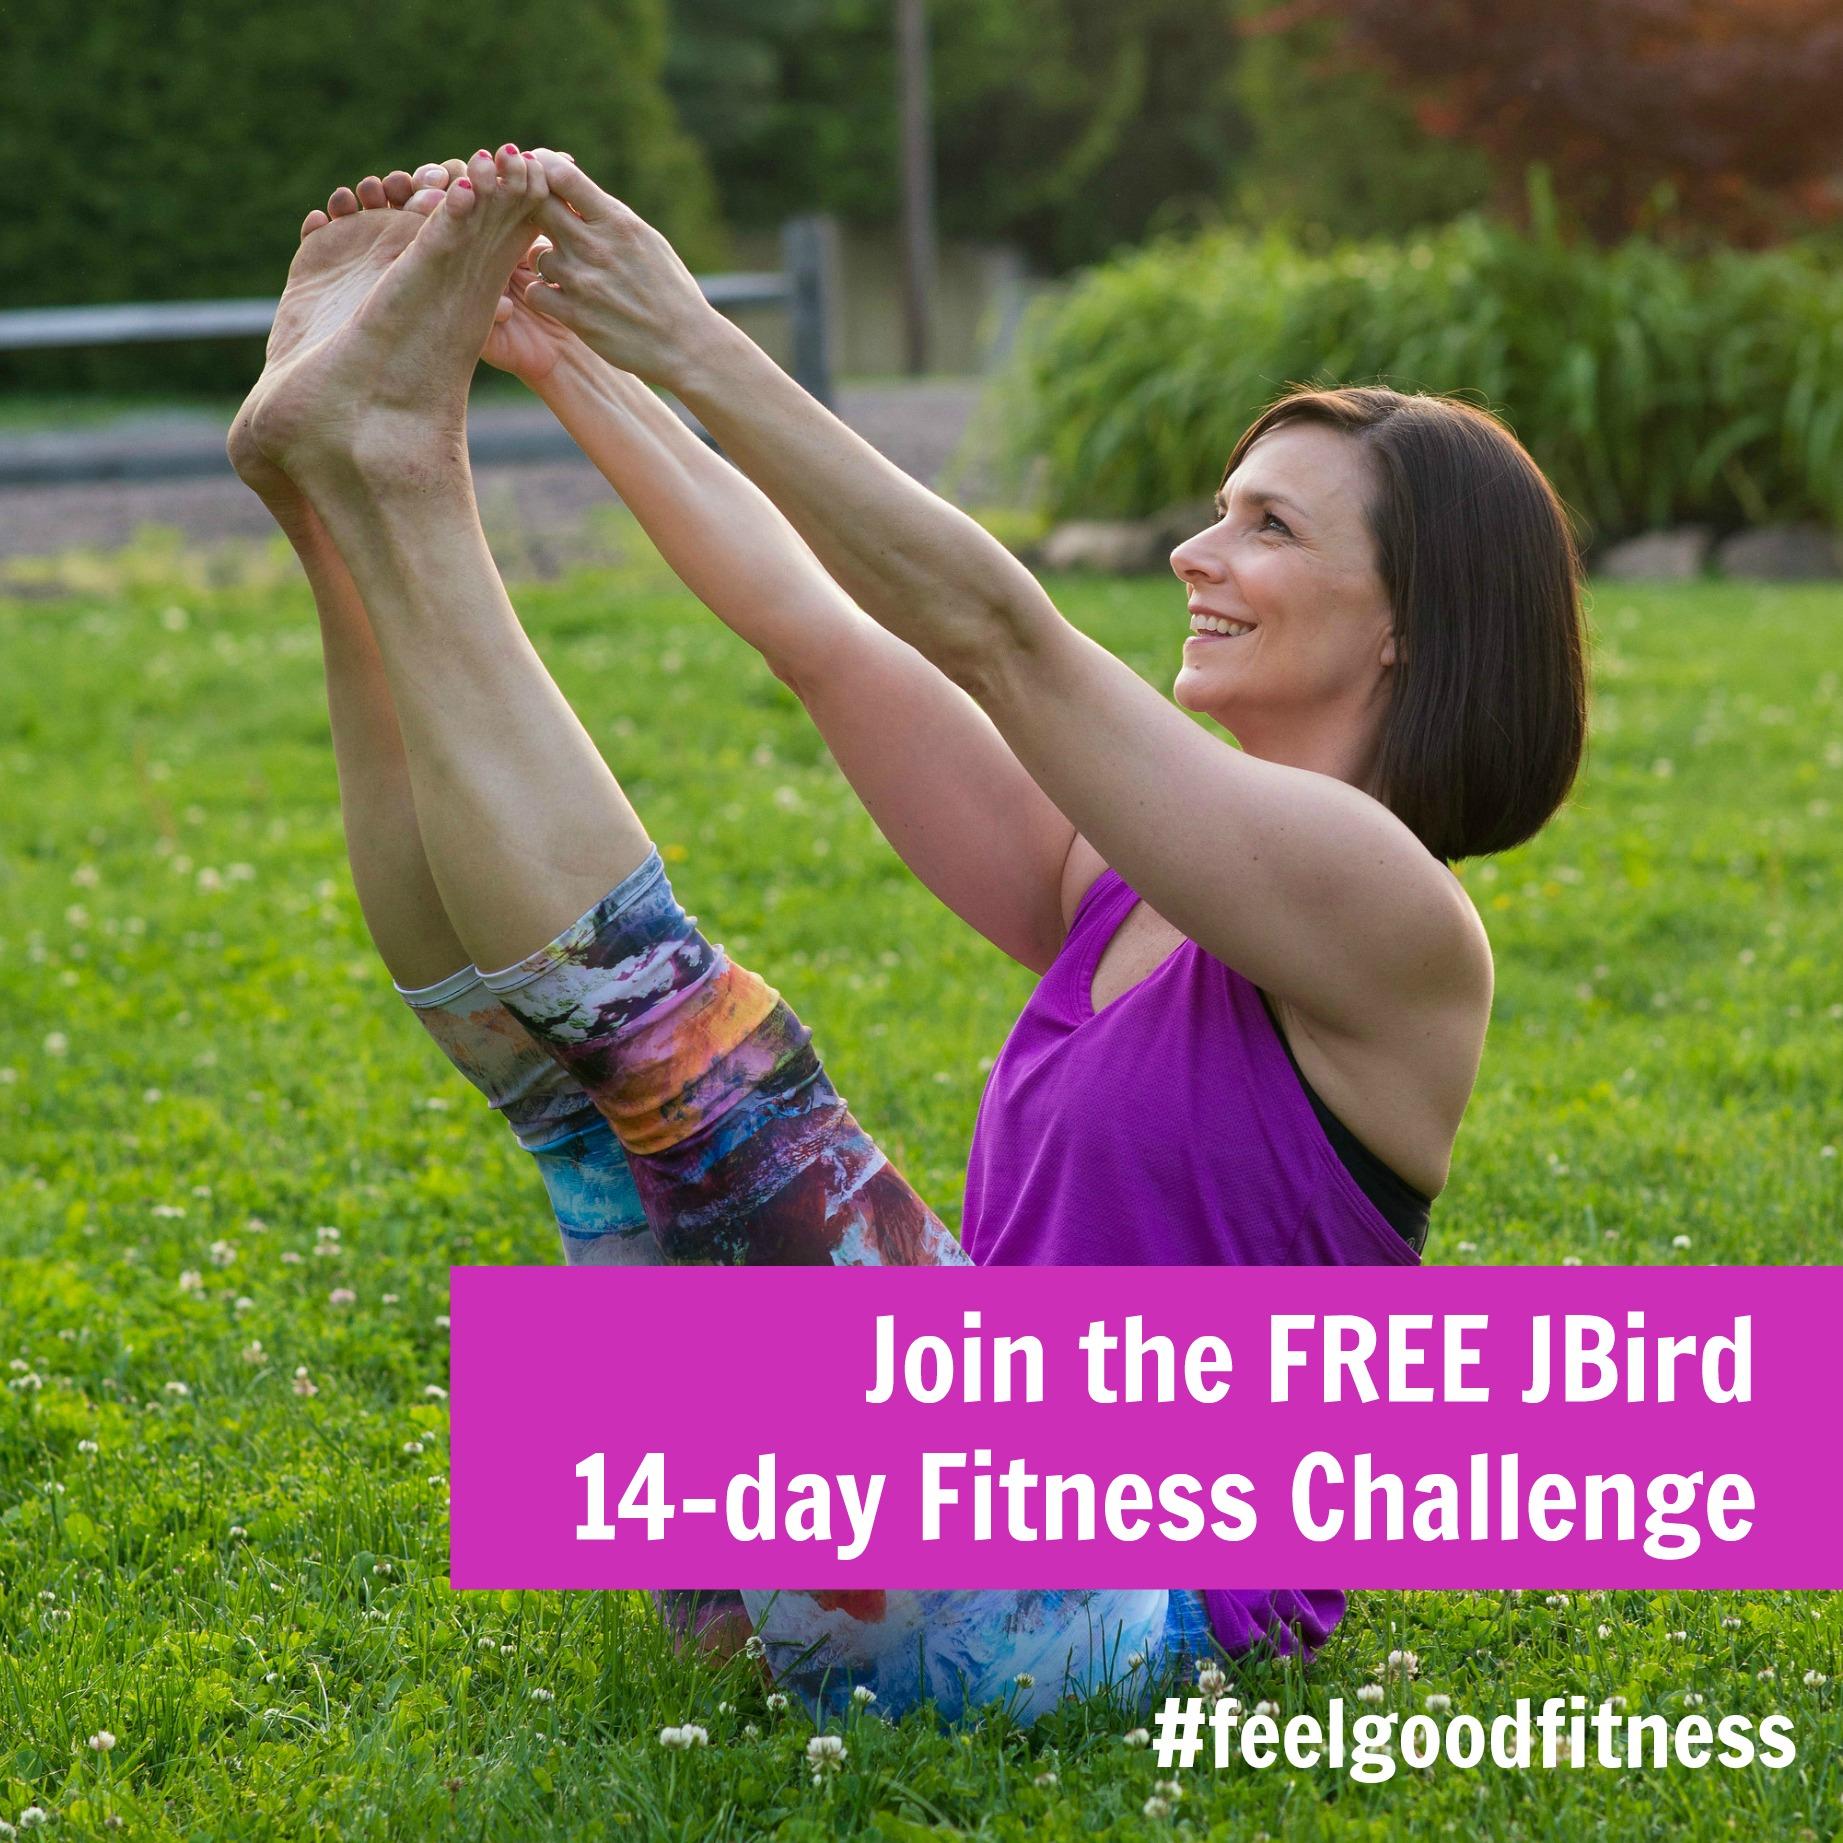 Fitness Challenge #feelgoodfitness